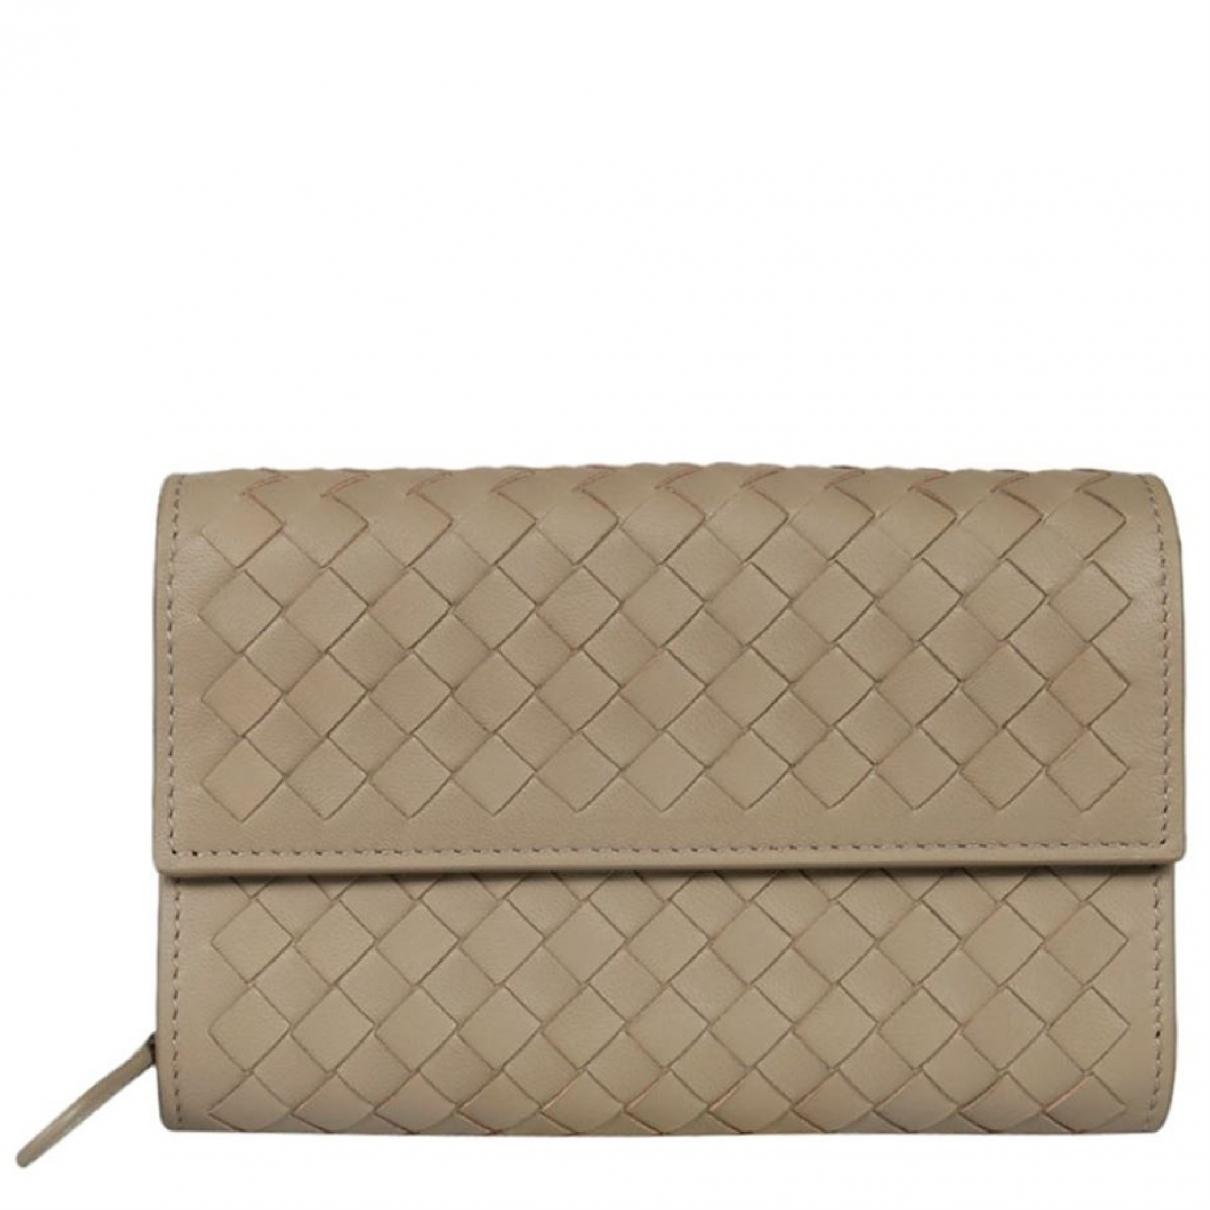 Bottega Veneta \N Grey Leather wallet for Women \N